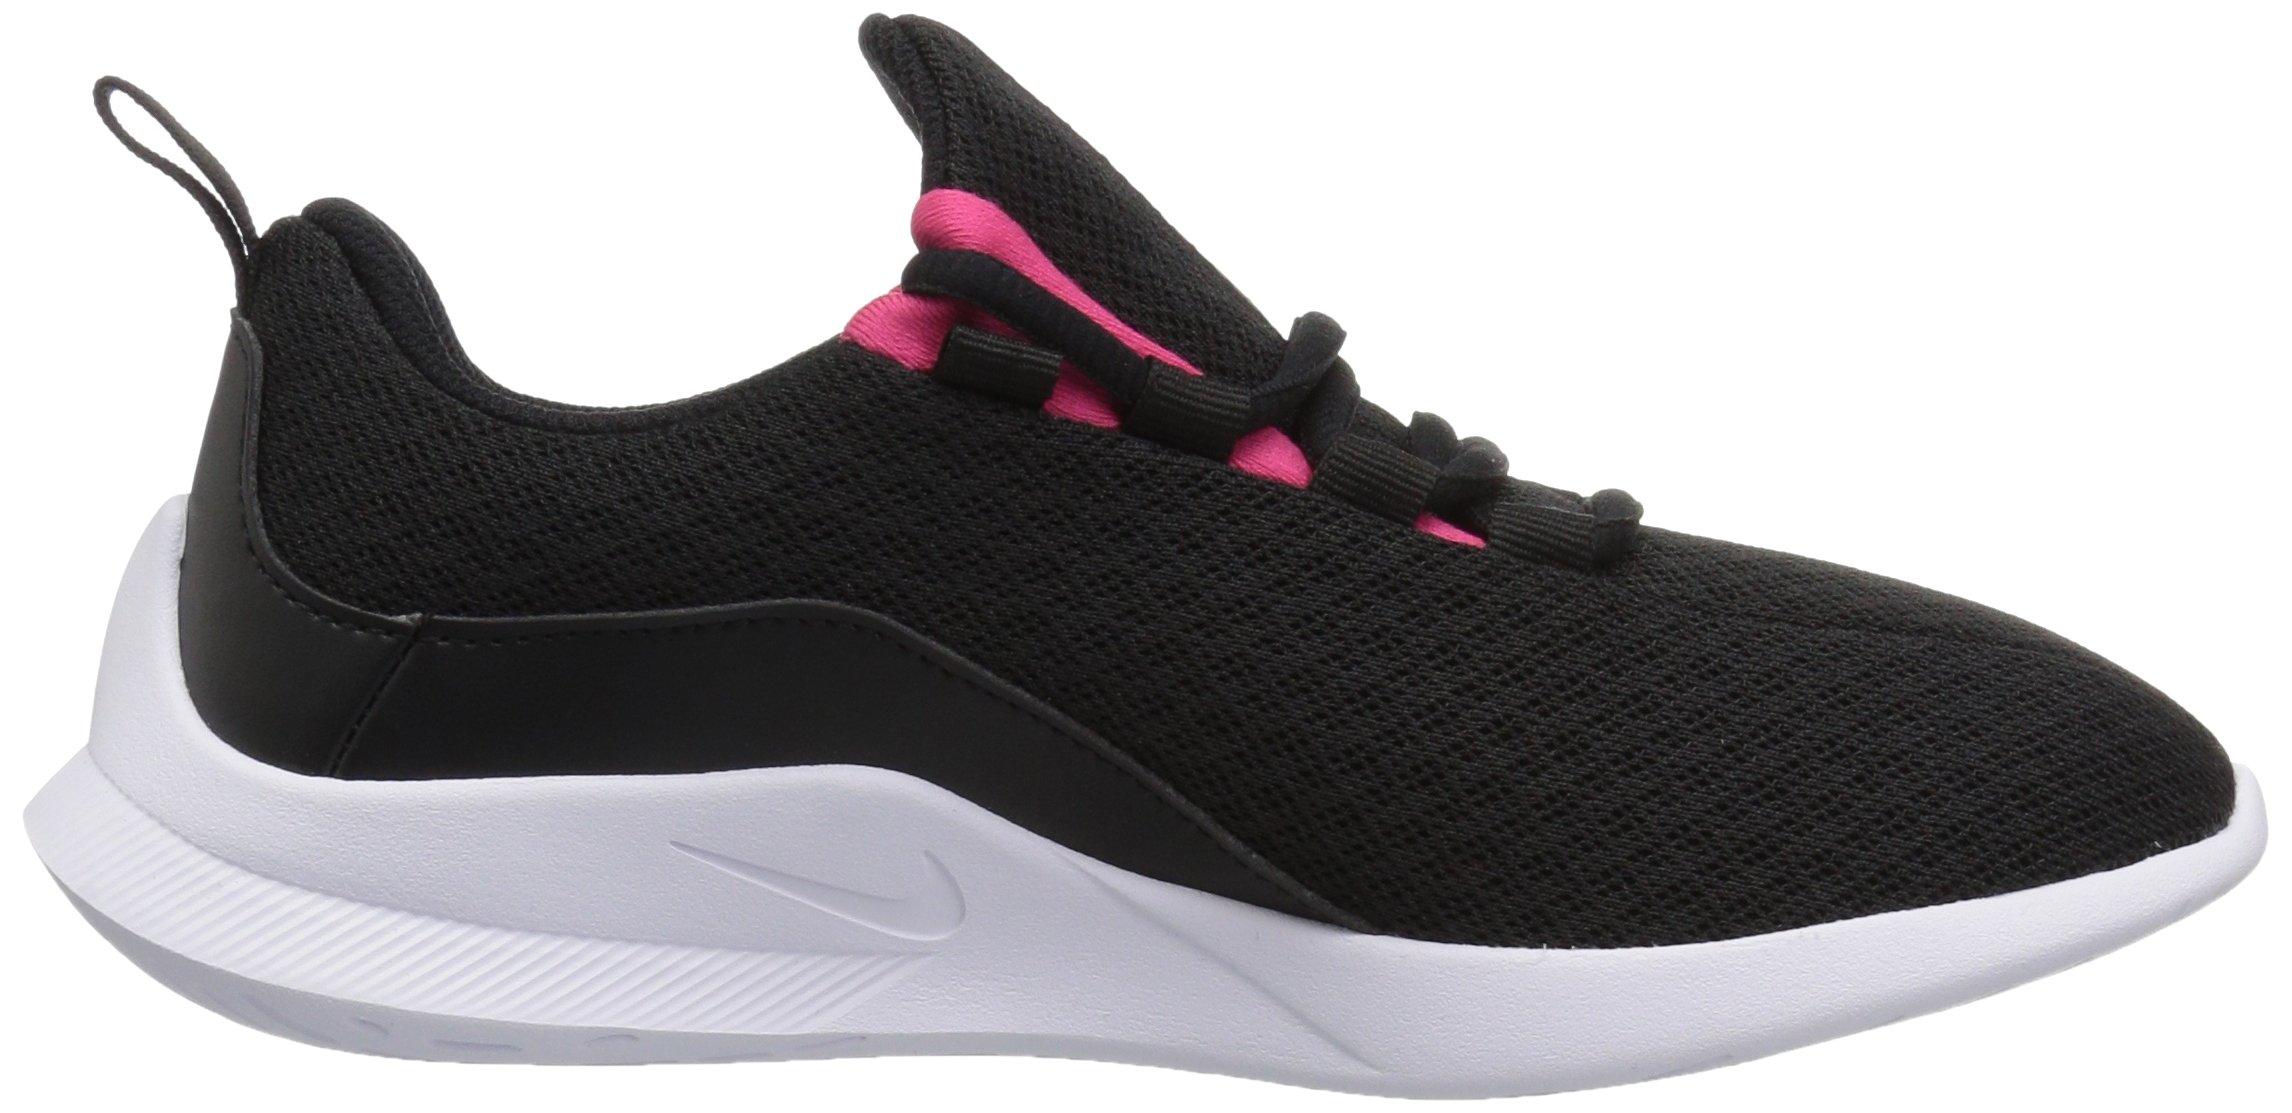 Nike Girls' Viale (GS) Running Shoe, Black/Rush Pink-White, 5Y Youth US Big Kid by Nike (Image #6)